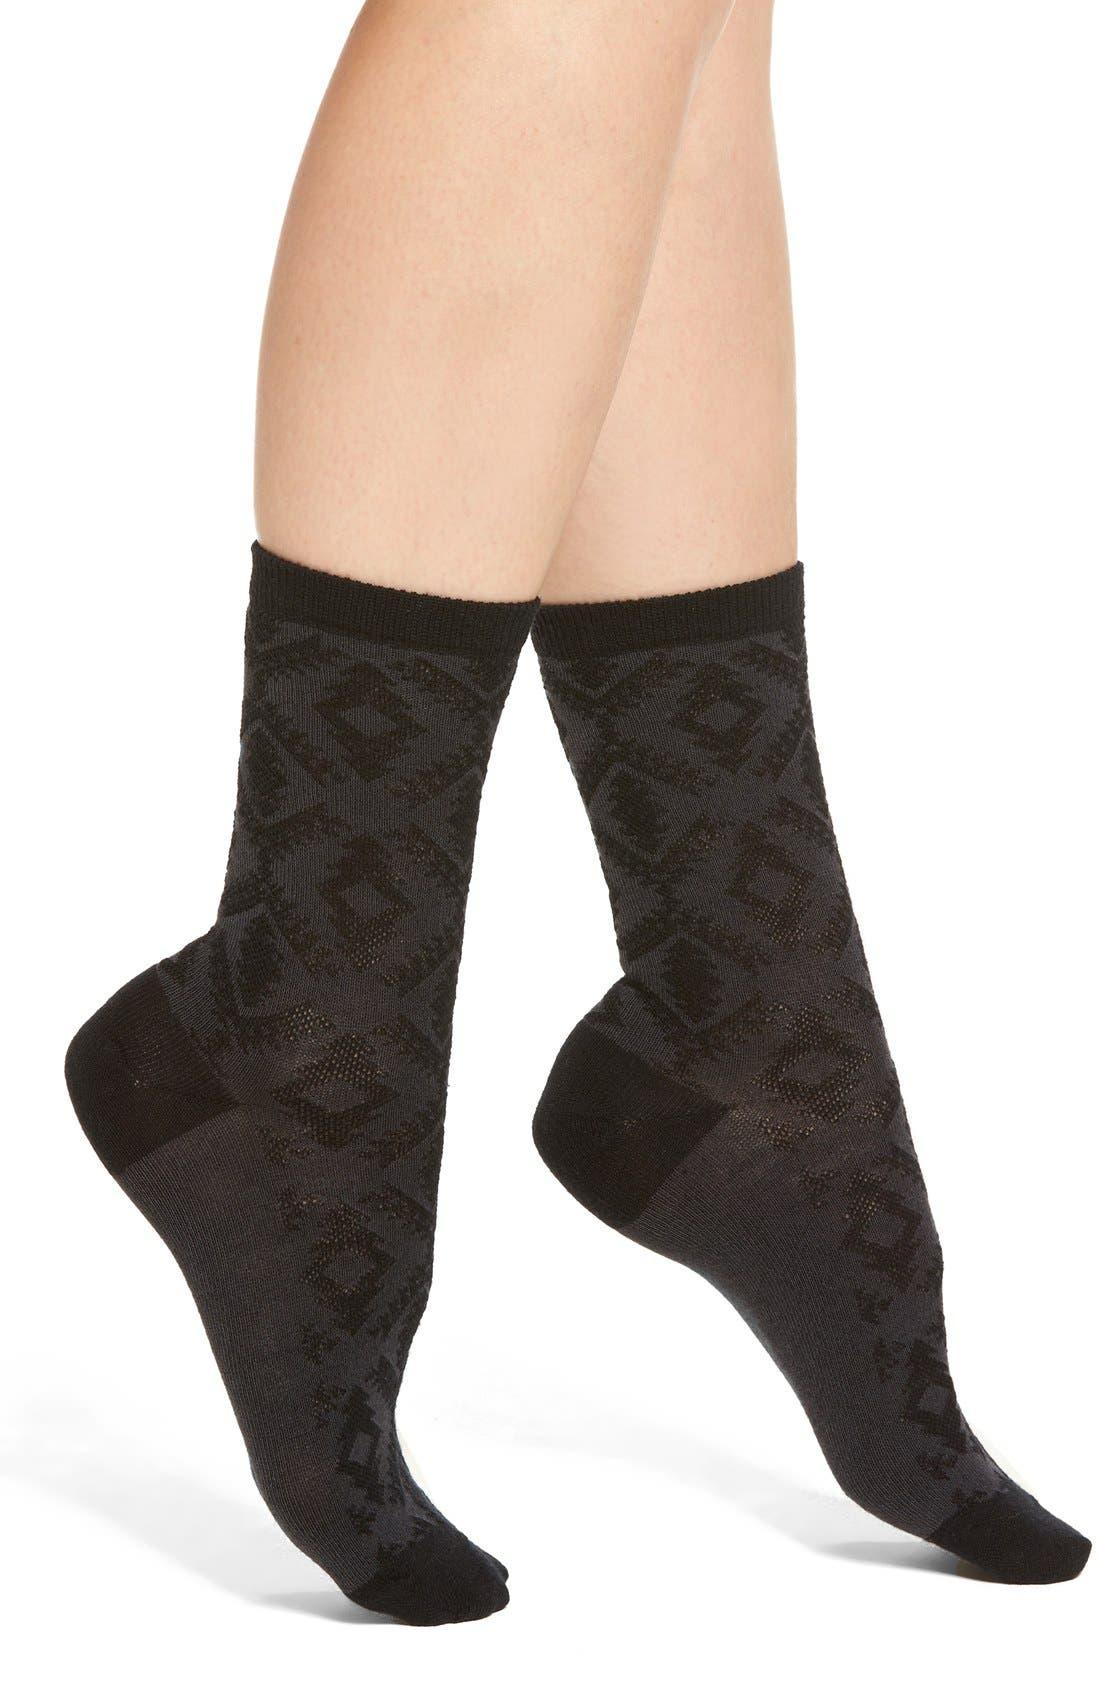 'Diamond River' Anklet Socks,                             Main thumbnail 1, color,                             001